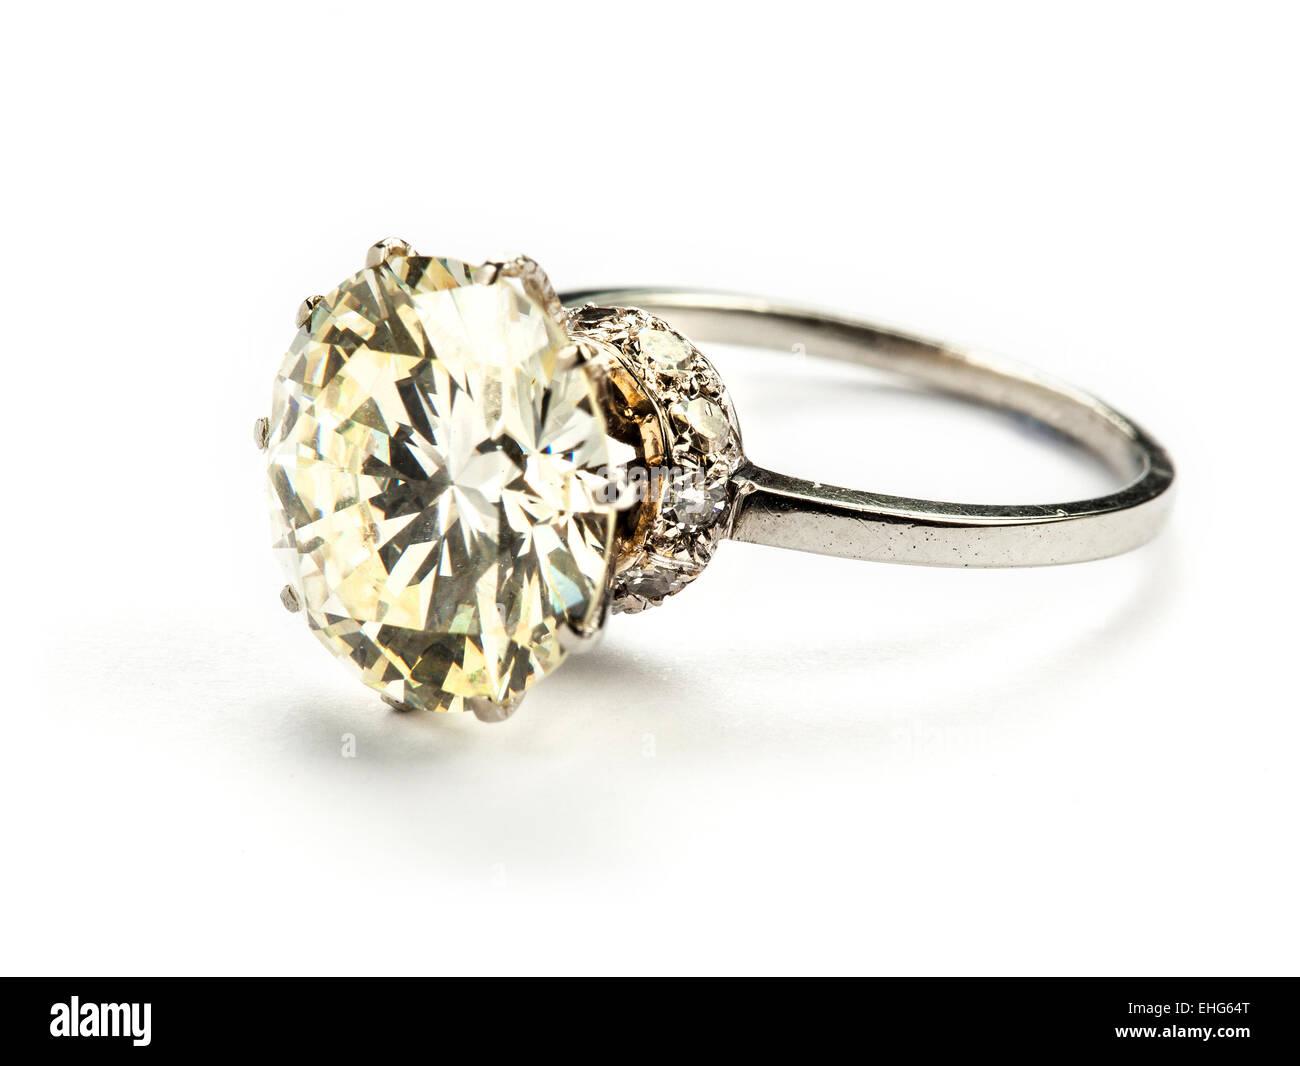 stock photo ct diamond single stone ring valued between wedding ring 5 75ct diamond single stone ring valued between